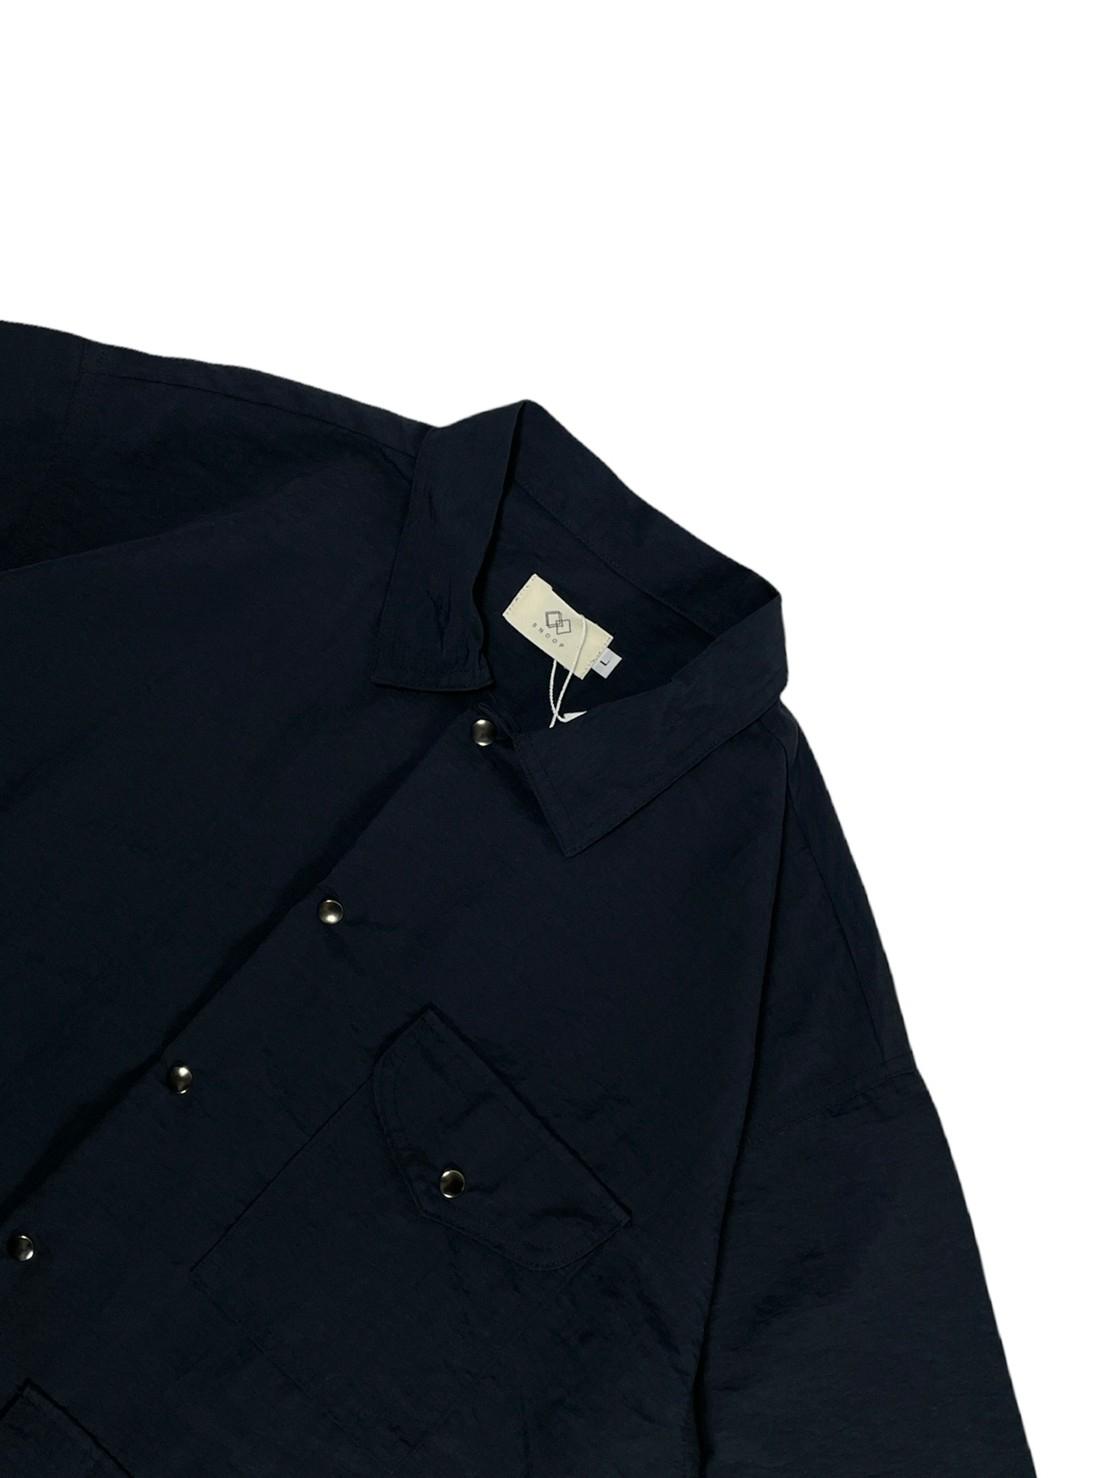 Camping Shirt Short Sleeve (Black)